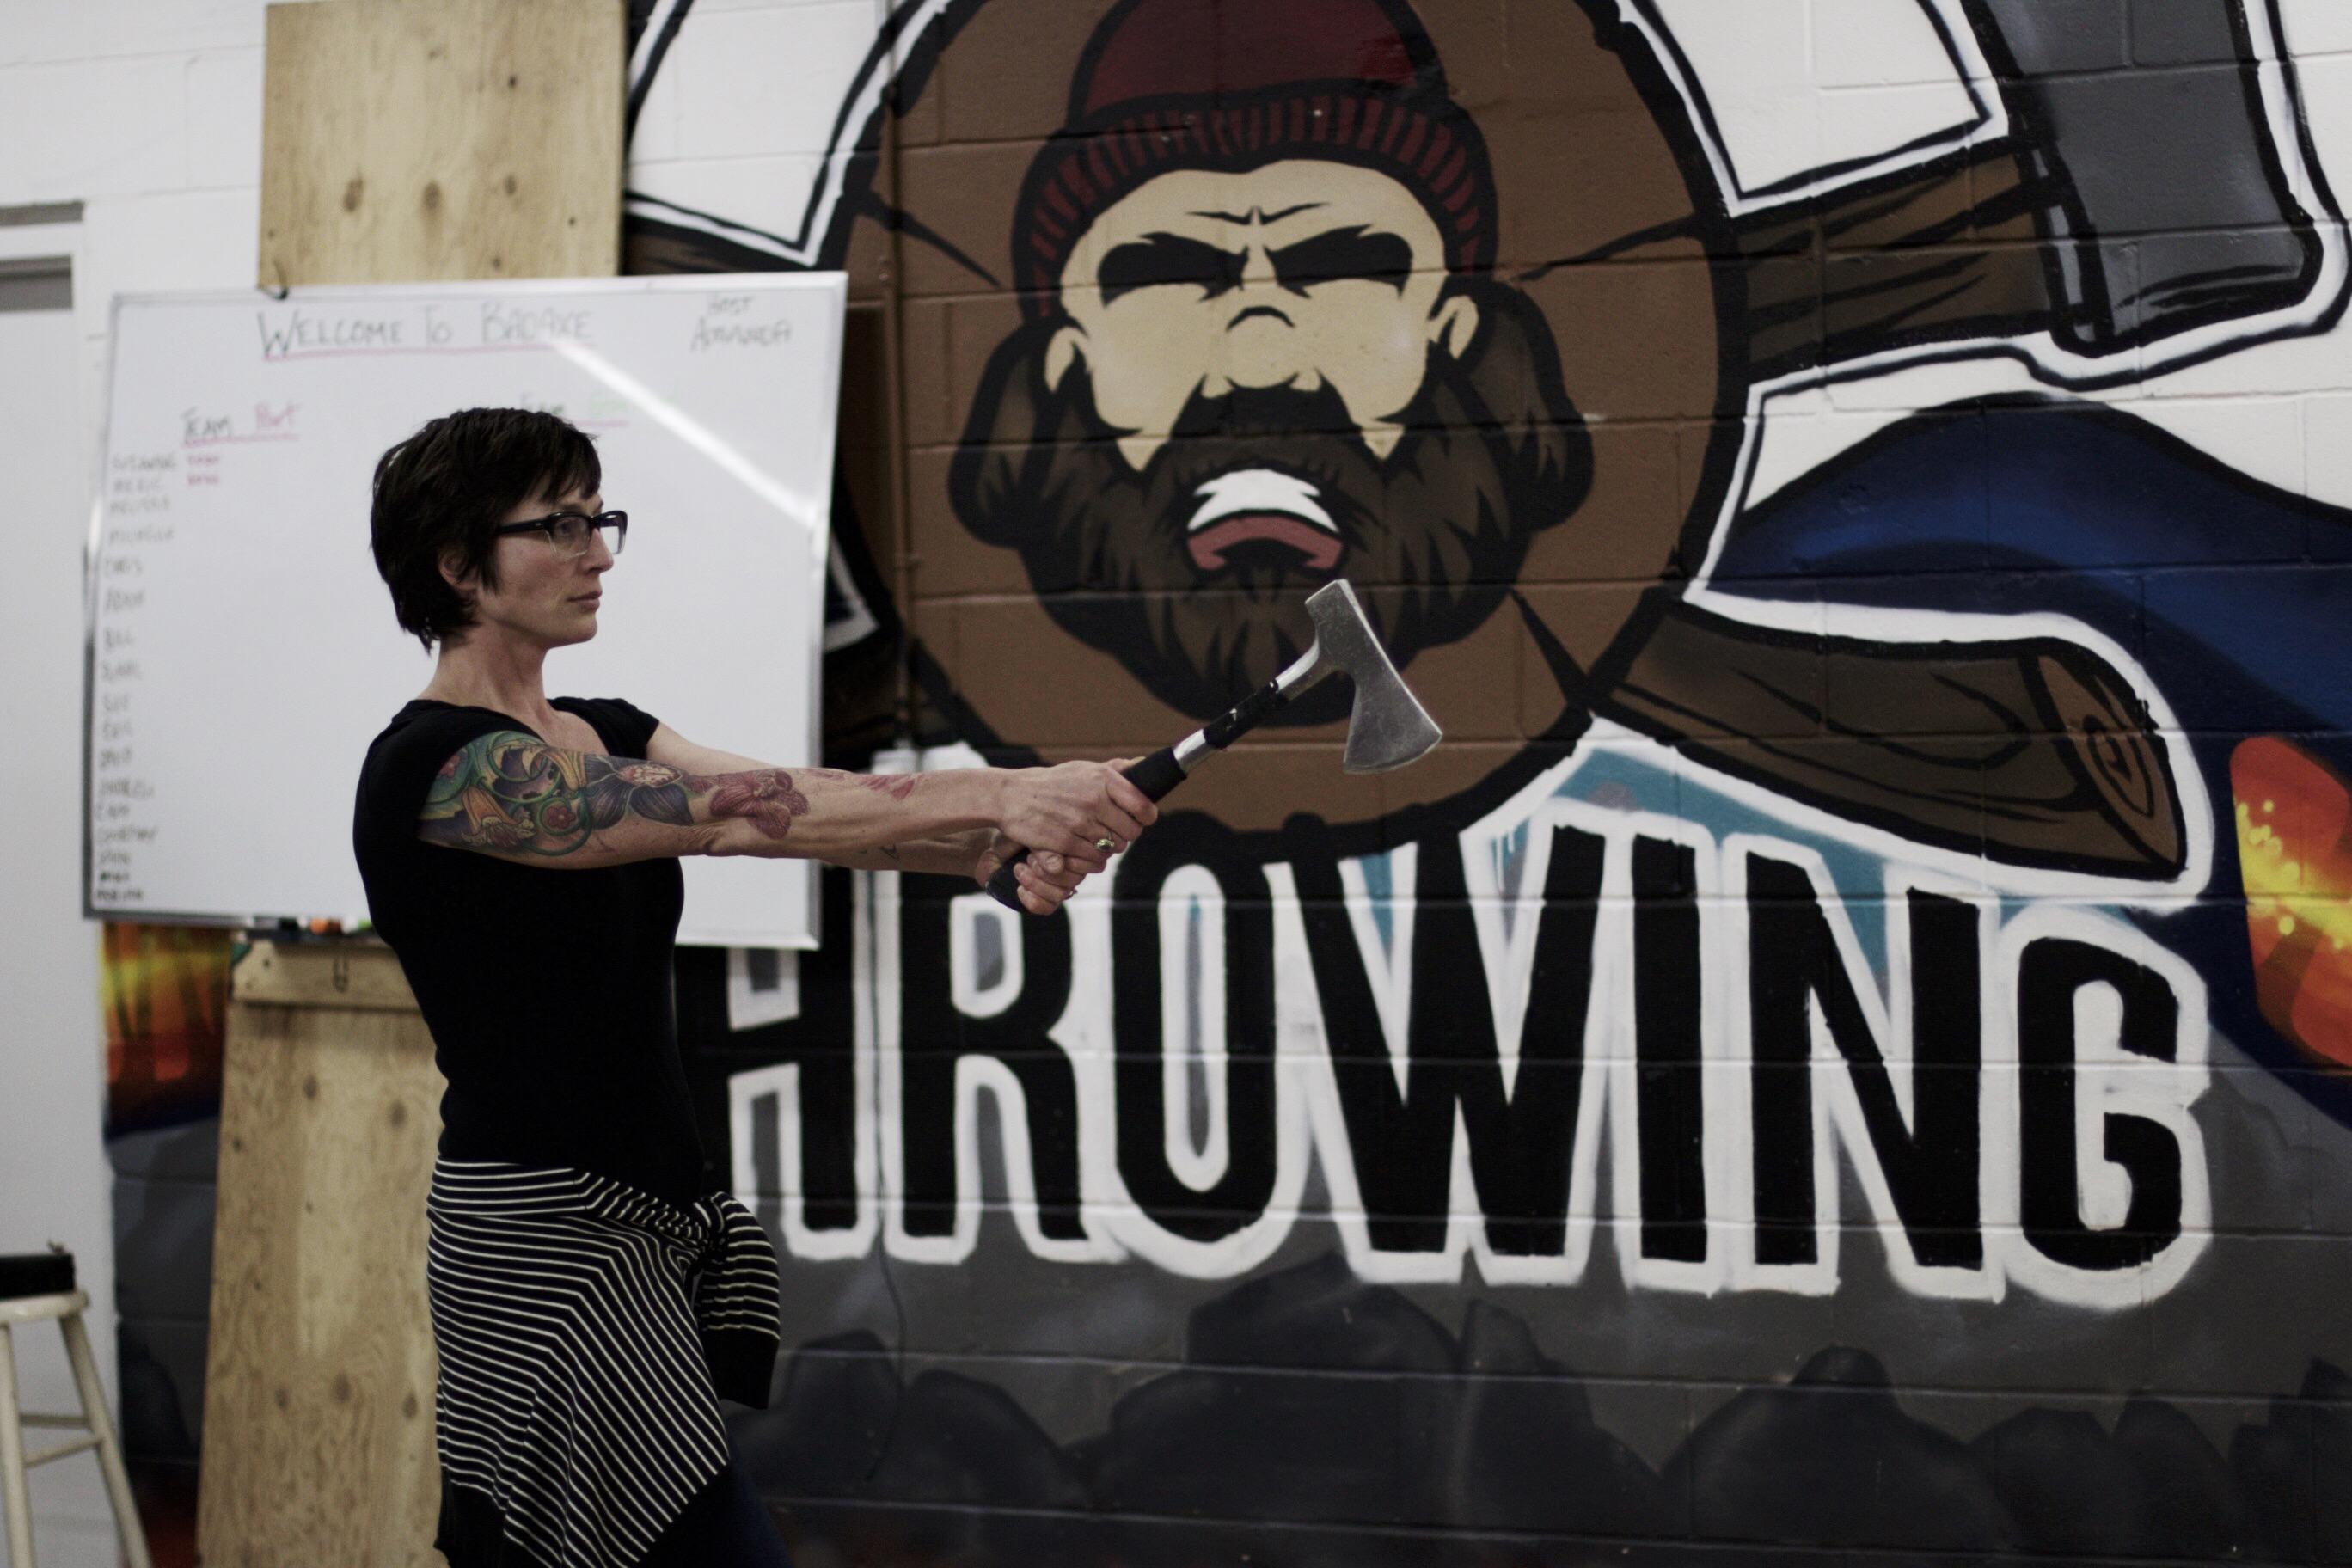 Bad Axe Throwing Graffiti Mural